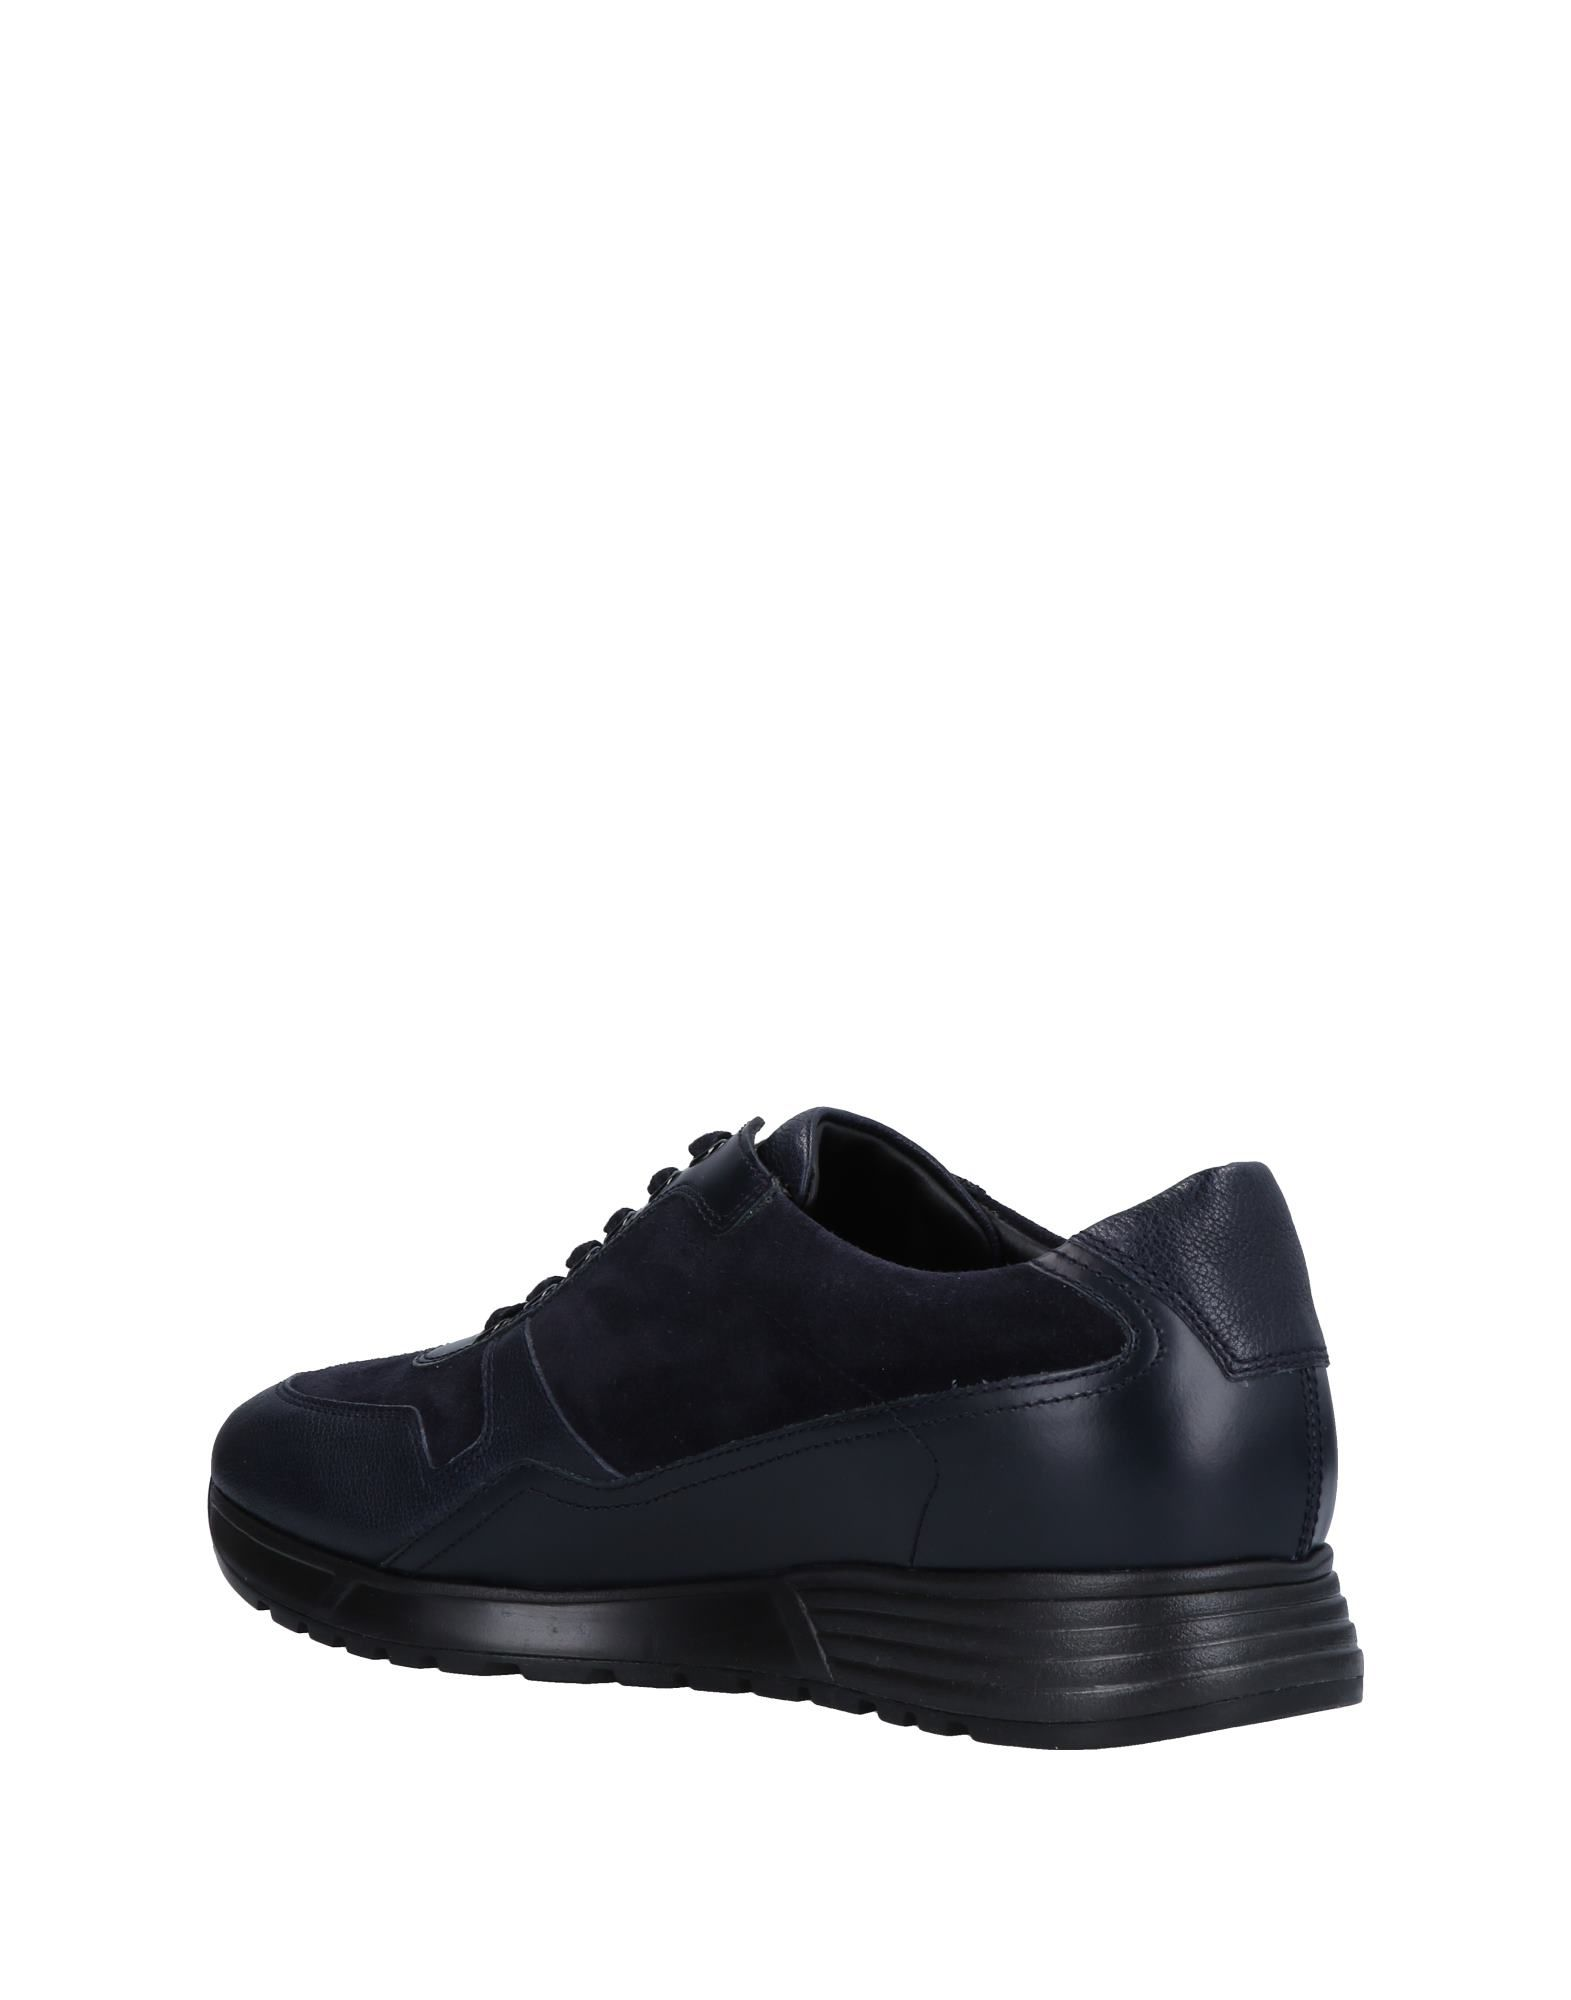 Armani Collezioni Sneakers Herren 11519562MR  11519562MR Herren Neue Schuhe a4b920